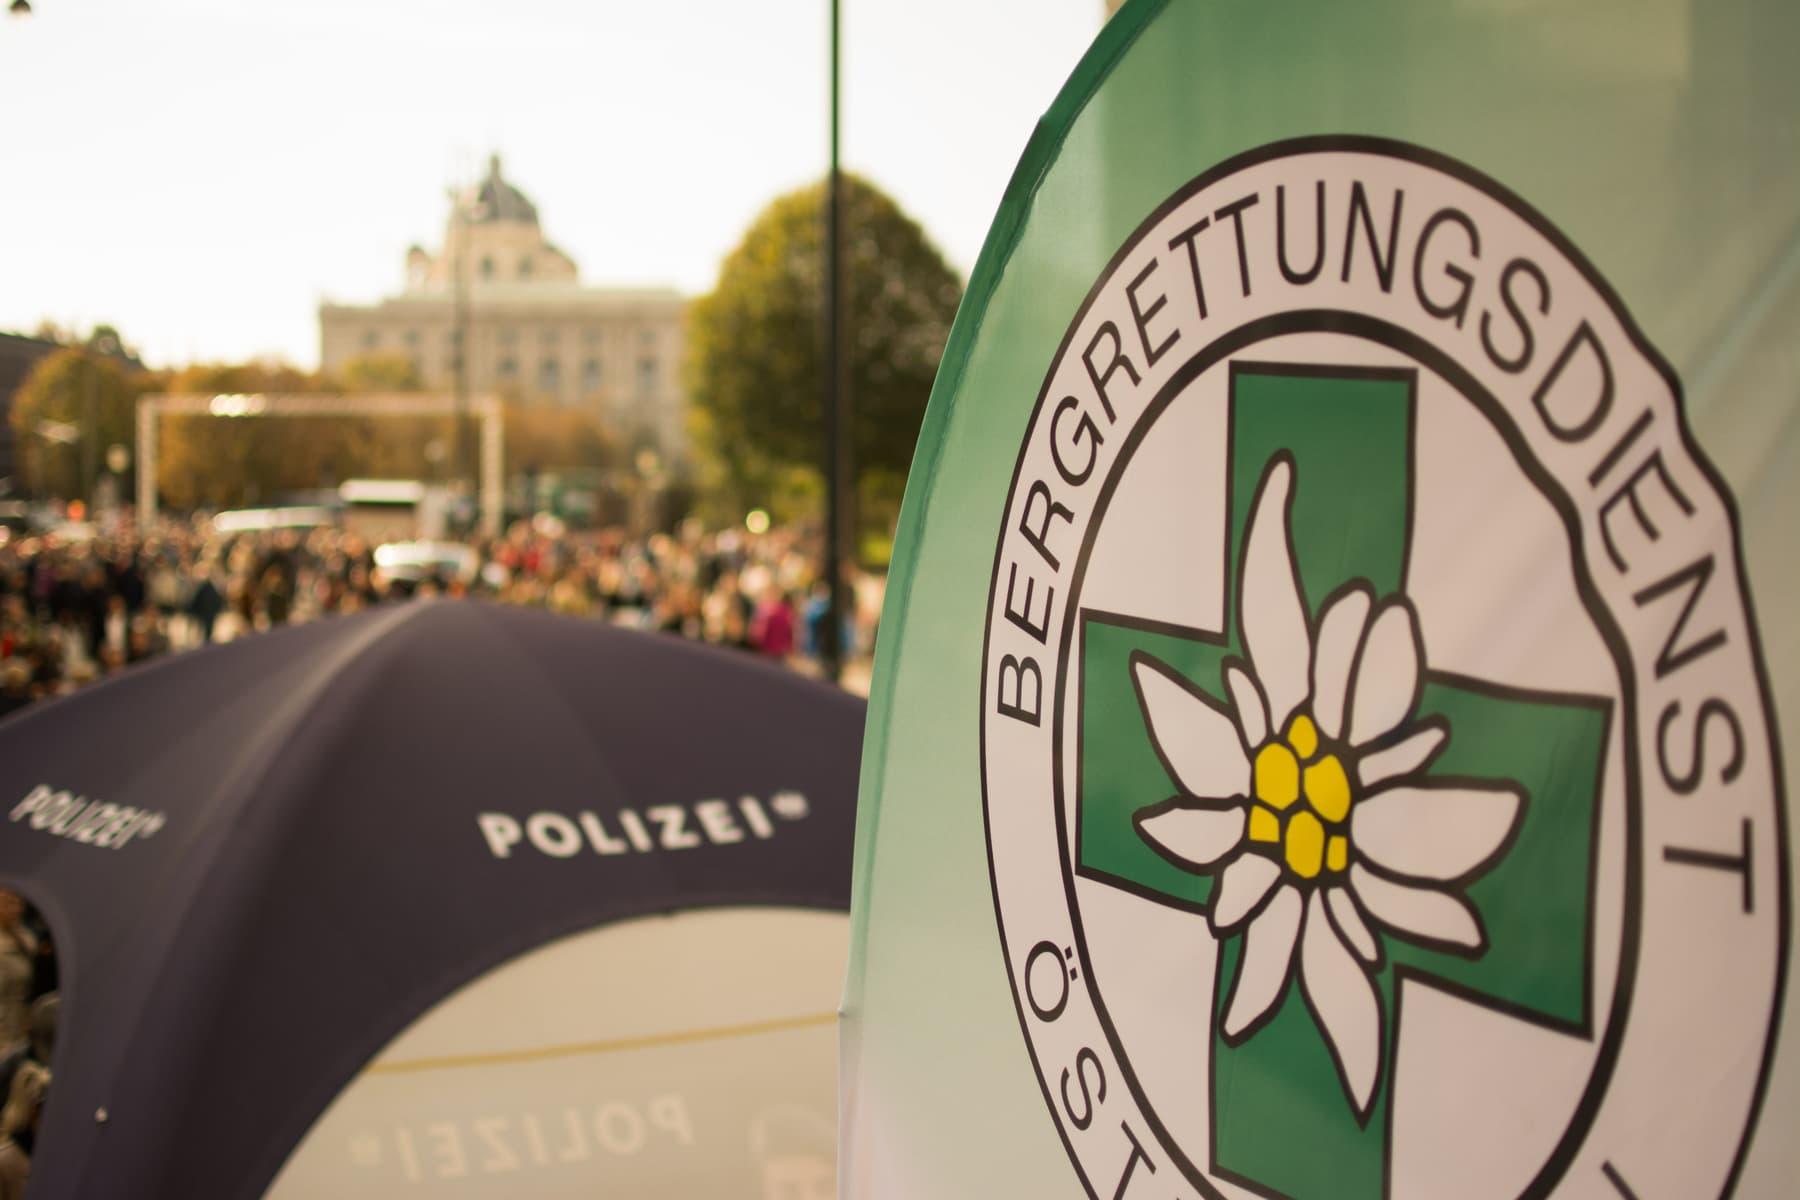 20181026_OEBRD Heldenplatz (1)